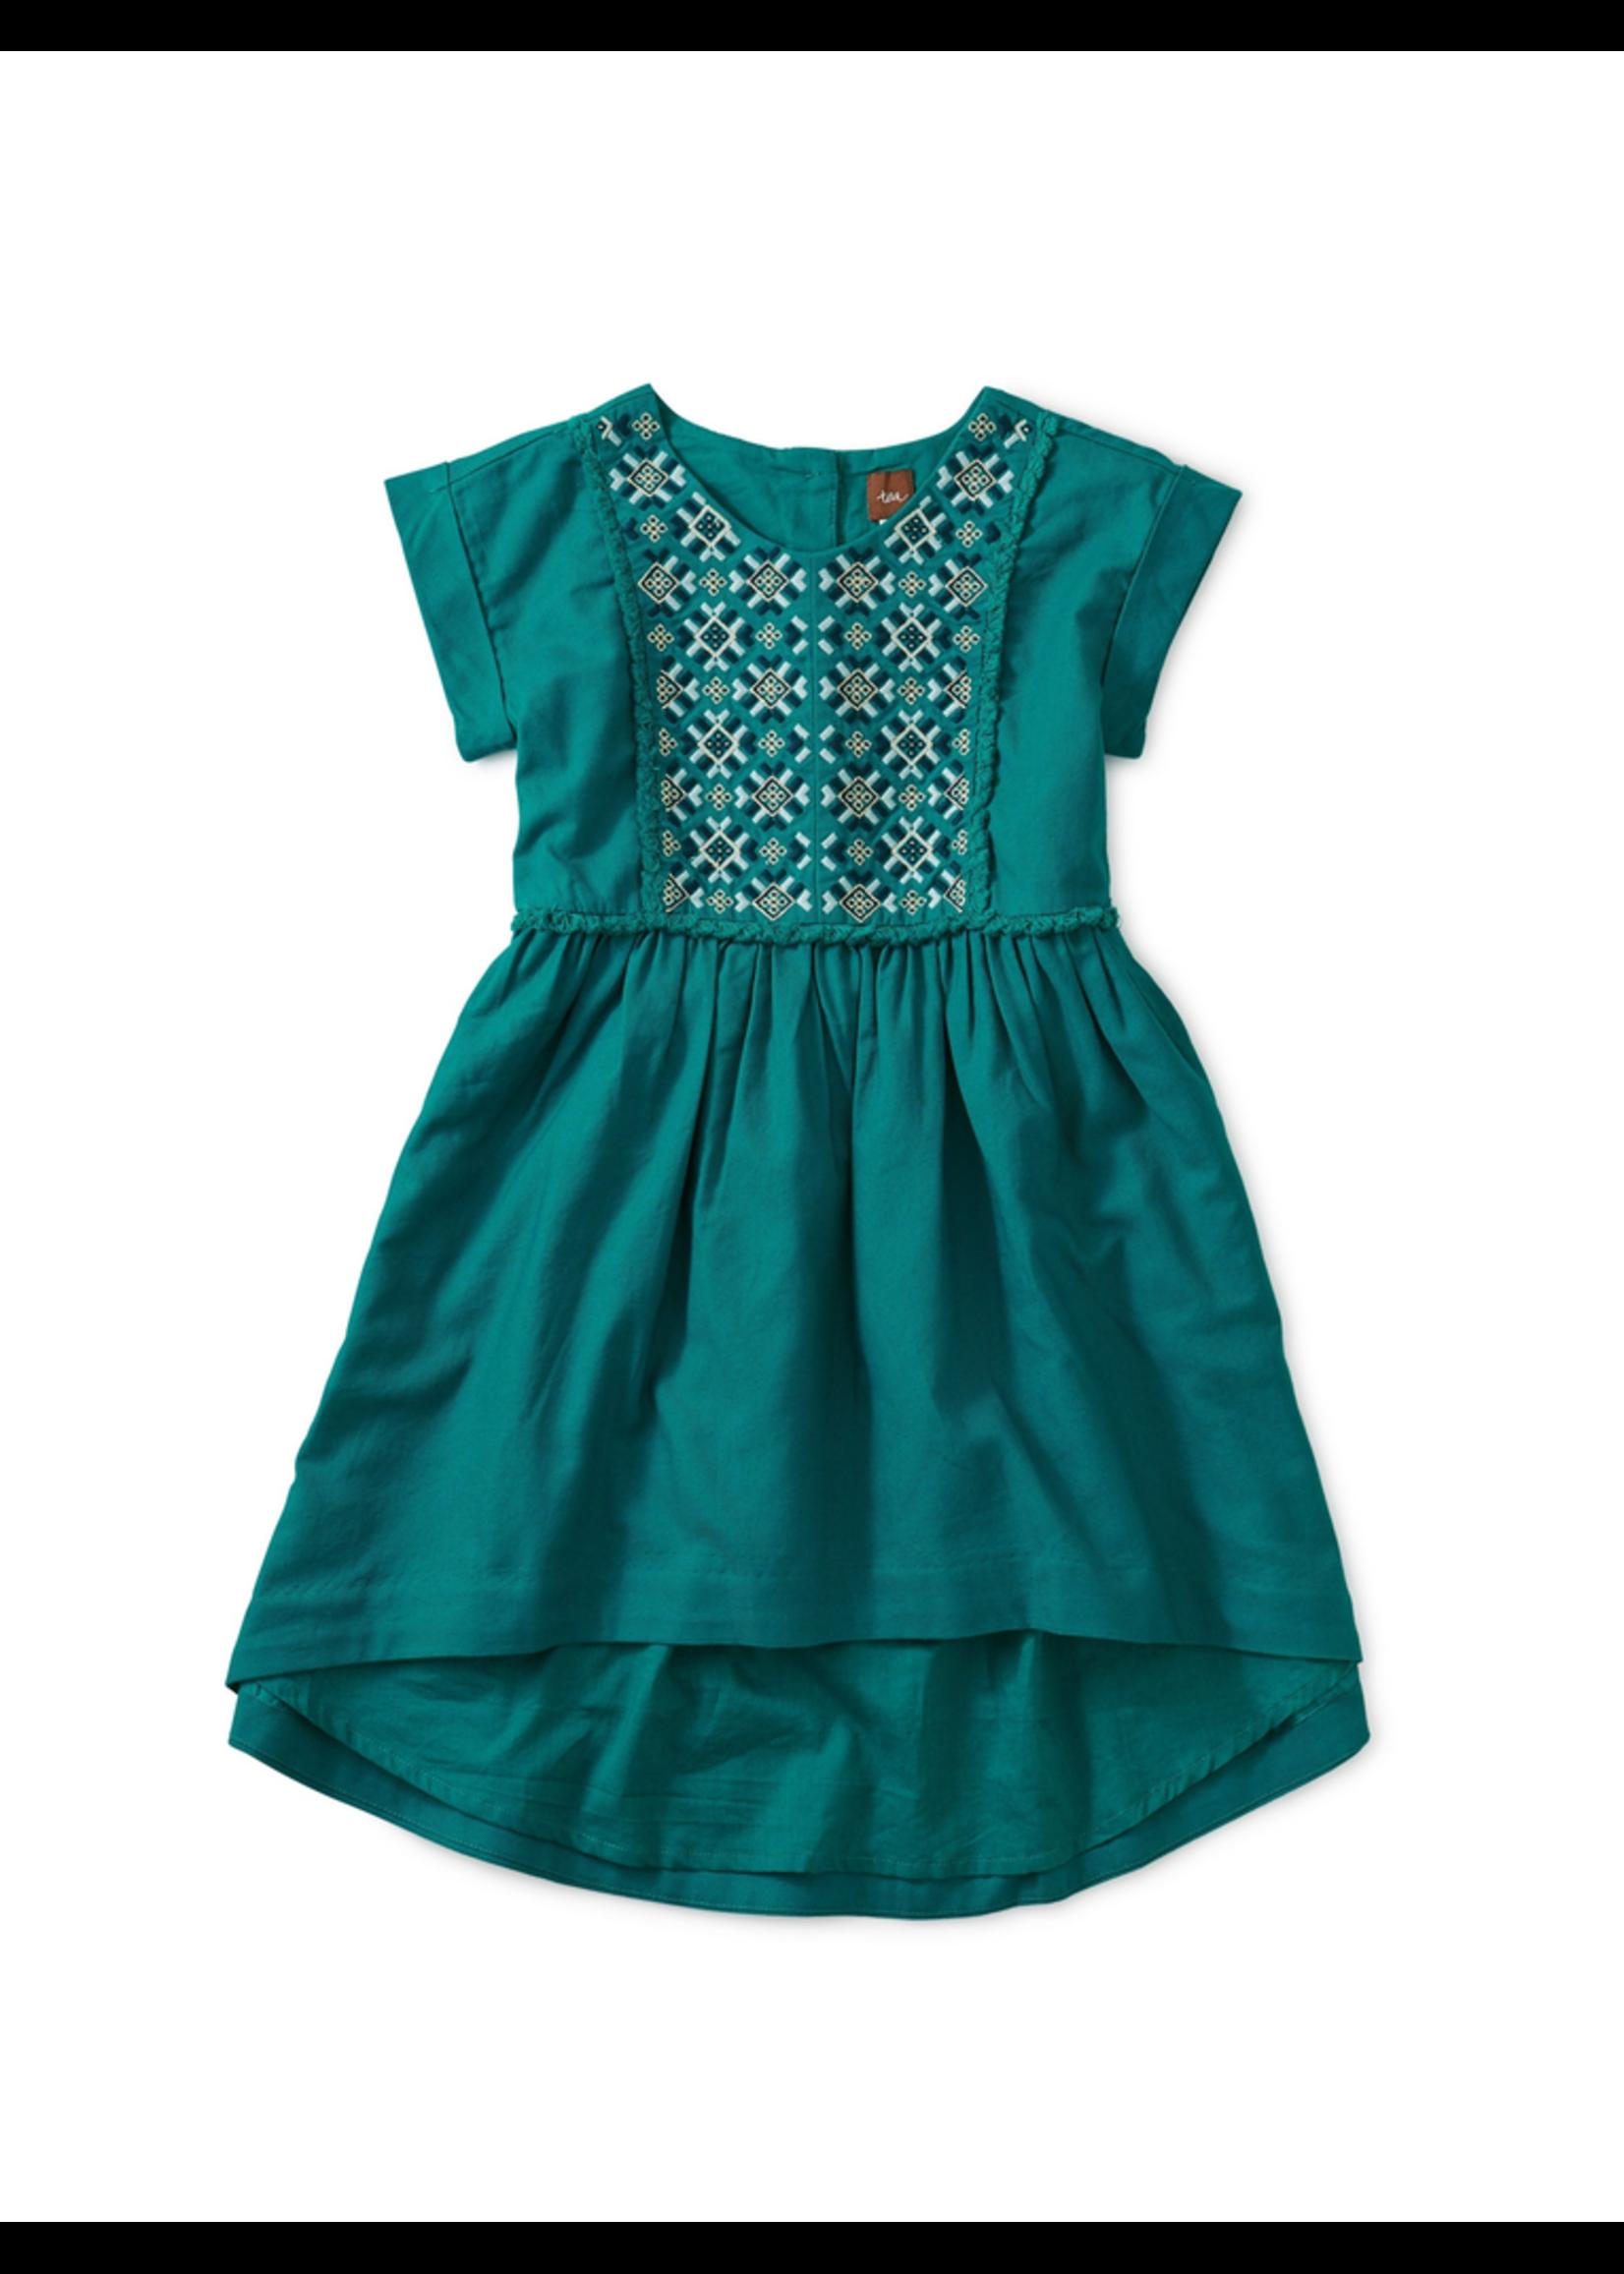 Tea Collection Tea Collection, Metallic Embroidered Hi-Lo Dress for Girl